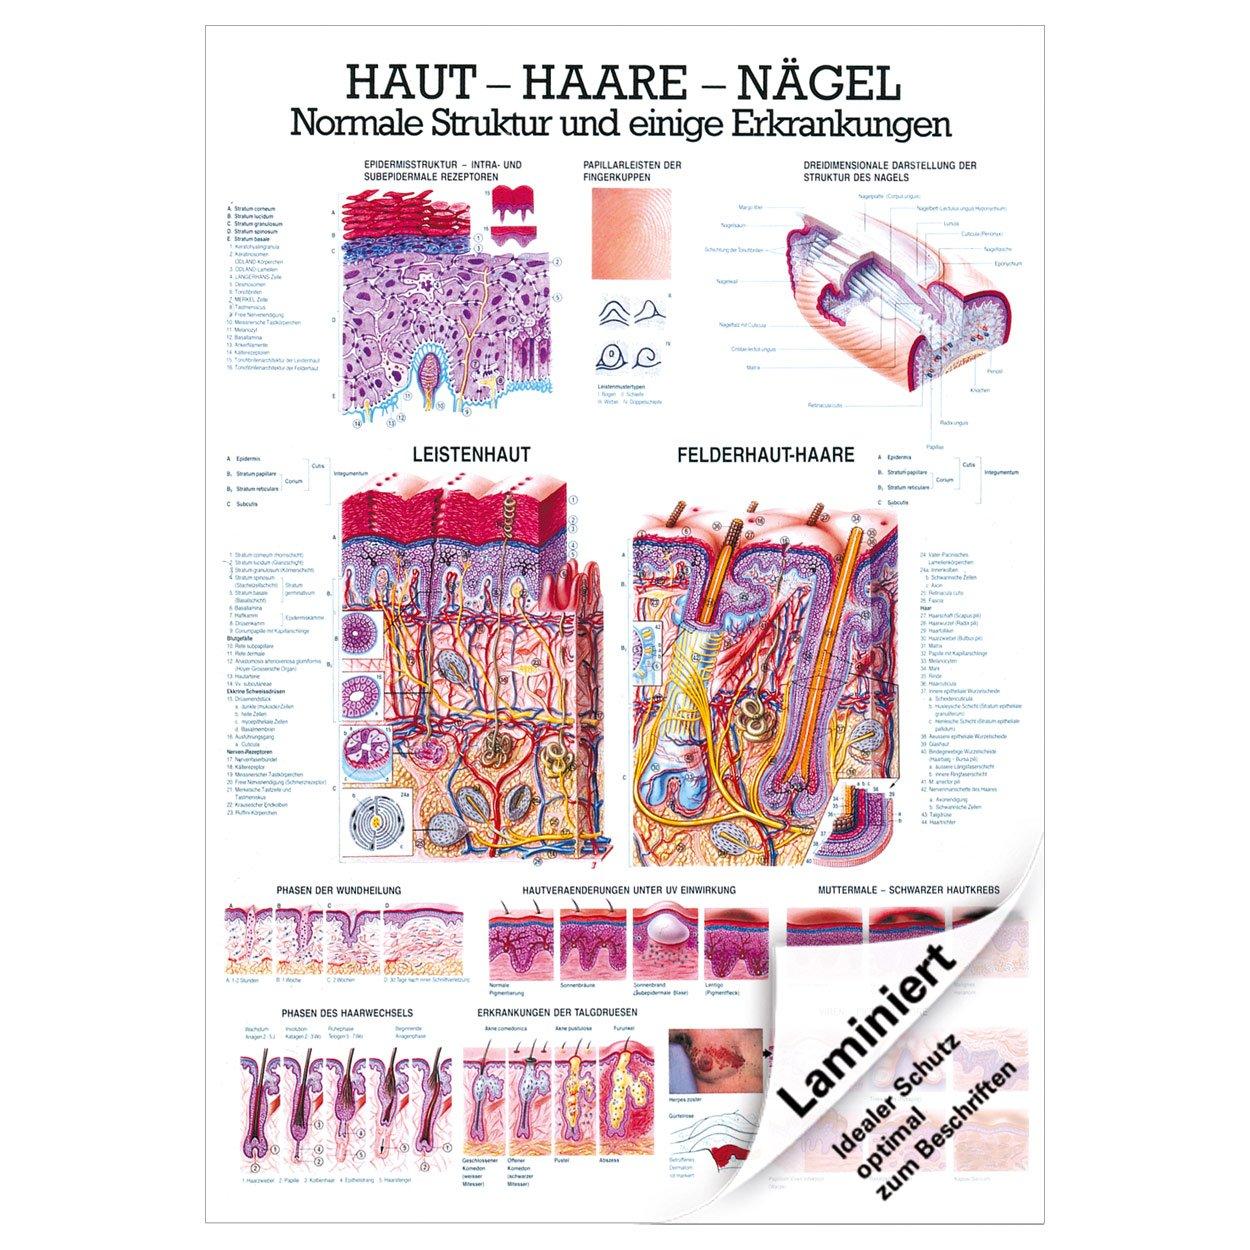 Haut-Haare-Nägel Lehrtafel Anatomie 100x70 cm medizinische ...